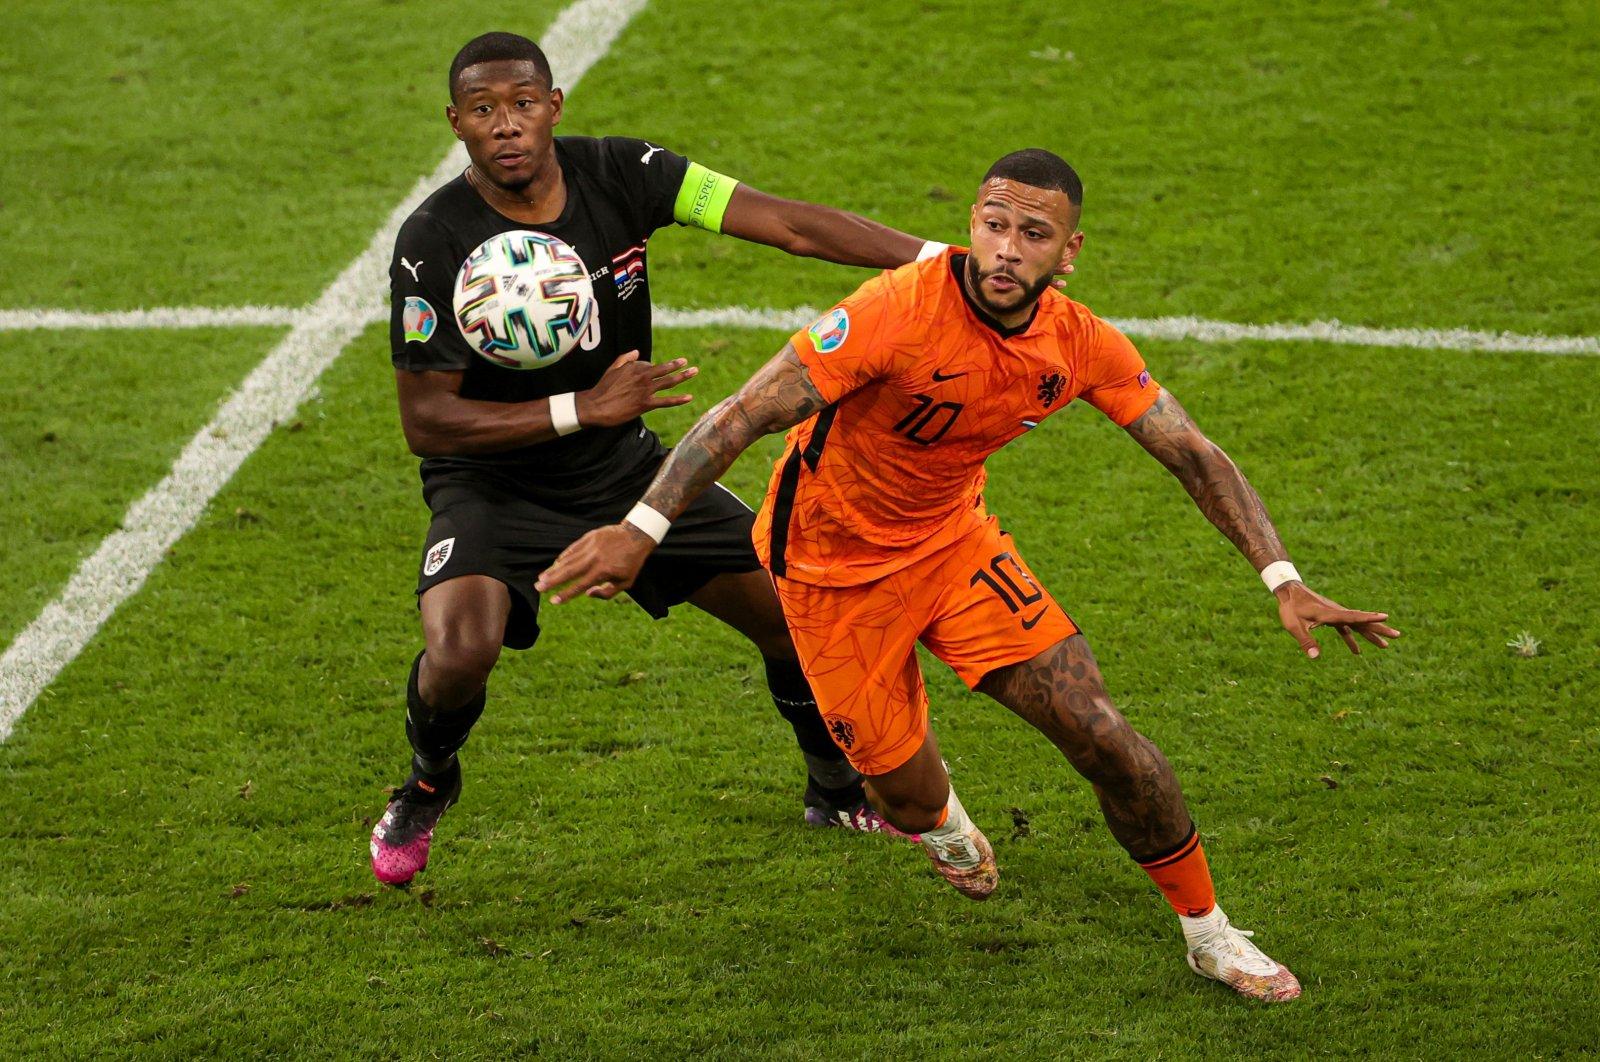 Barcelona signs Dutch forward Depay in 2-year deal